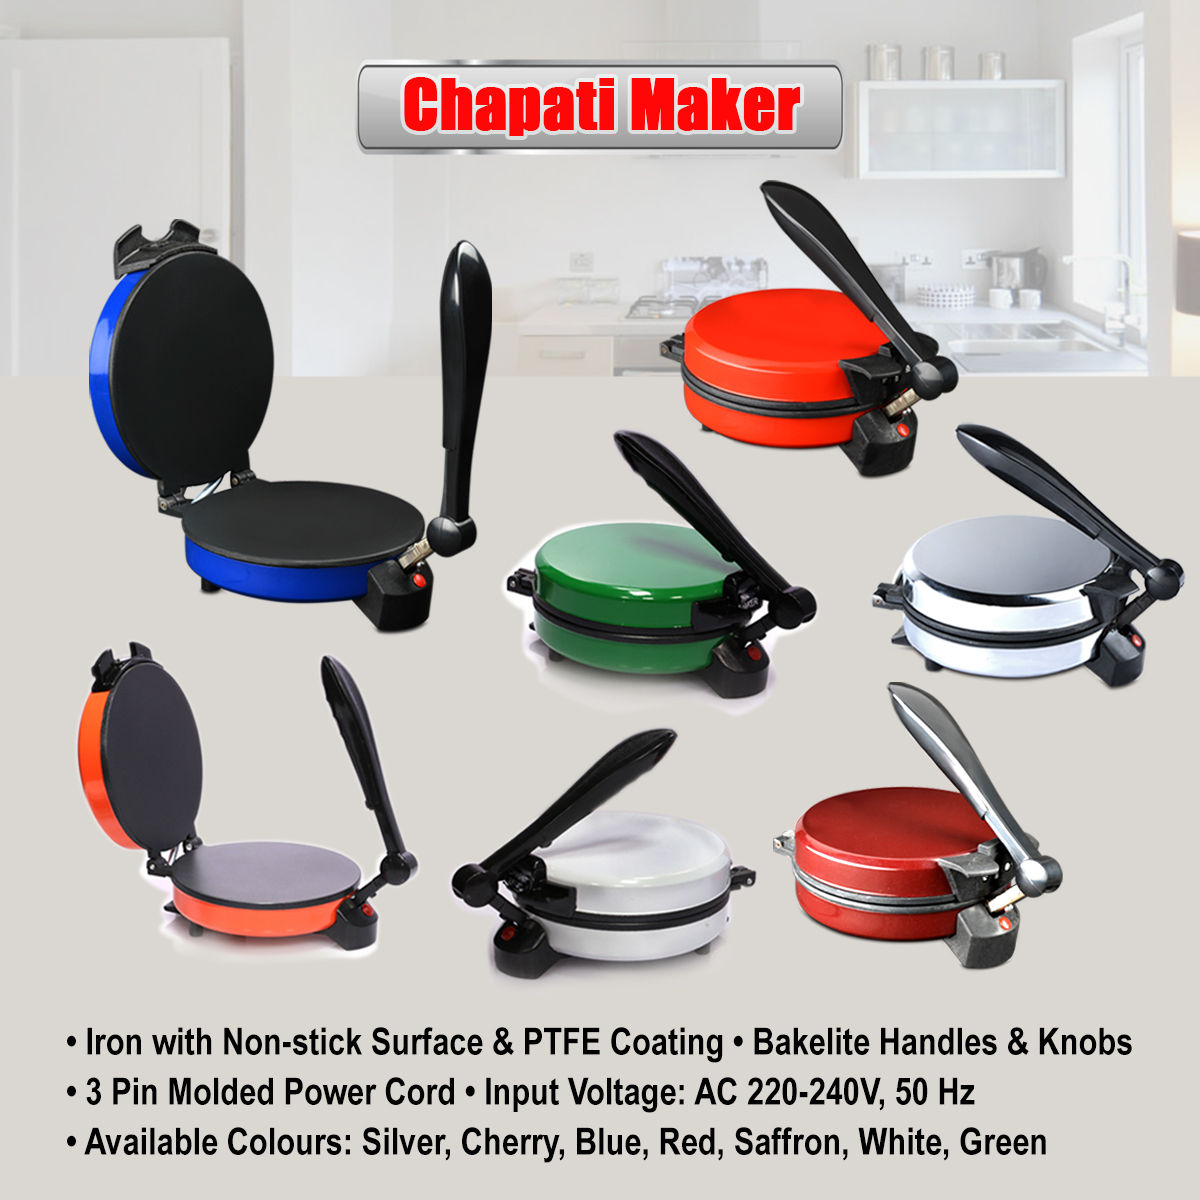 Home & Kitchen Appliances - Buy Home Appliances Online at Best Price ...